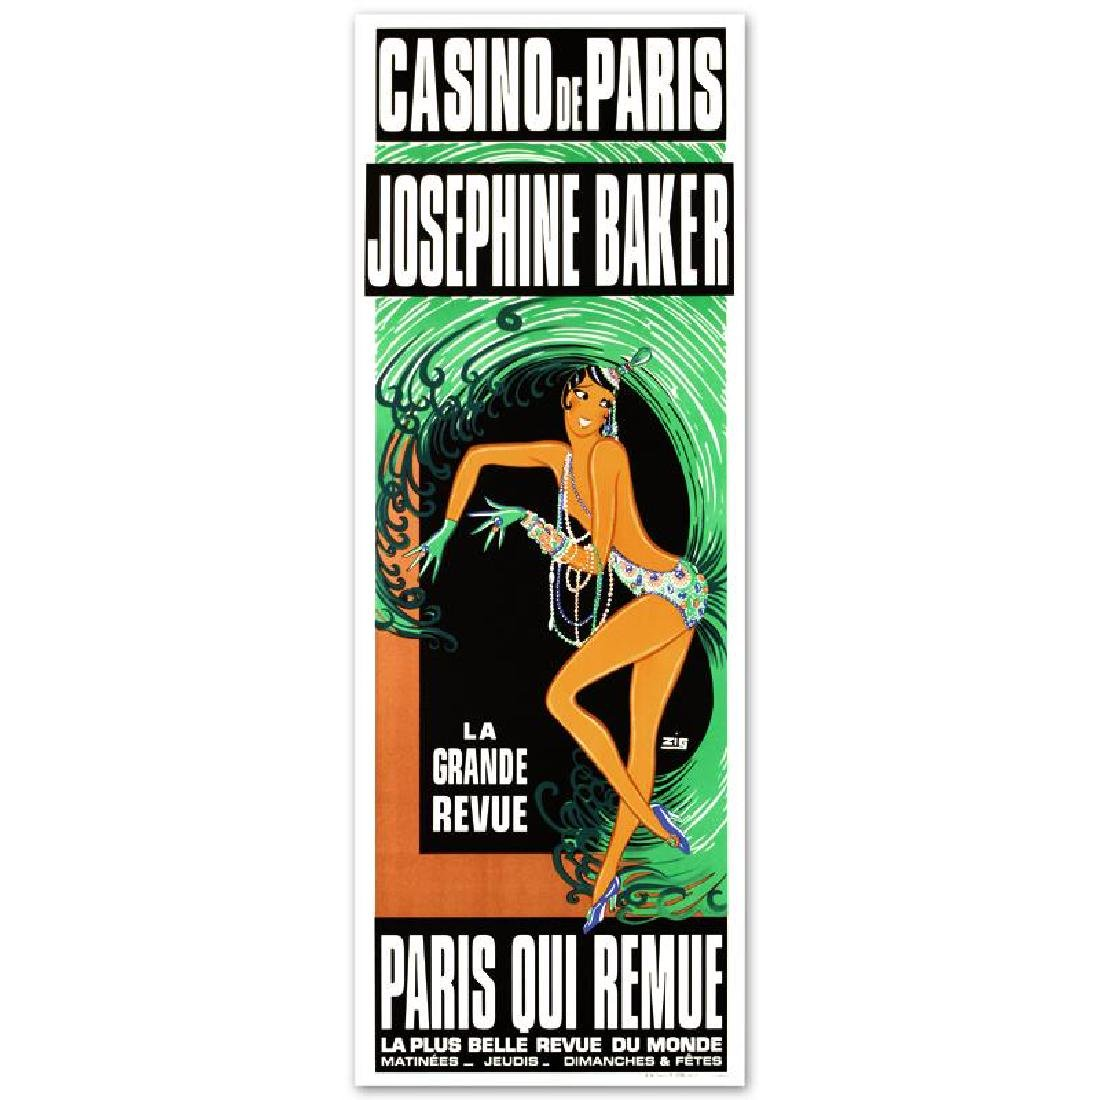 """Casino de Paris Josephine Baker"" Hand Pulled"